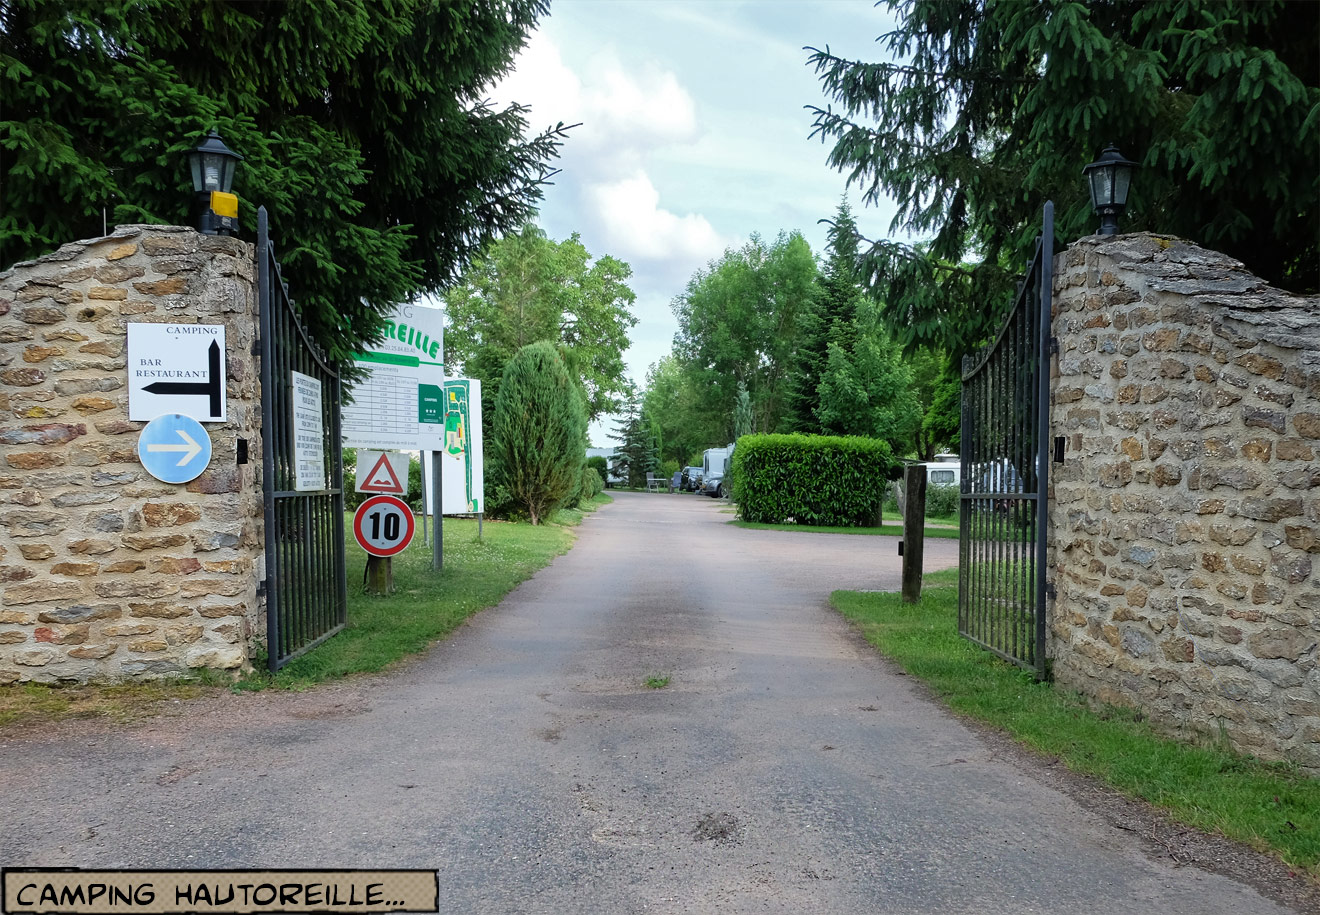 Camping Hautoreille